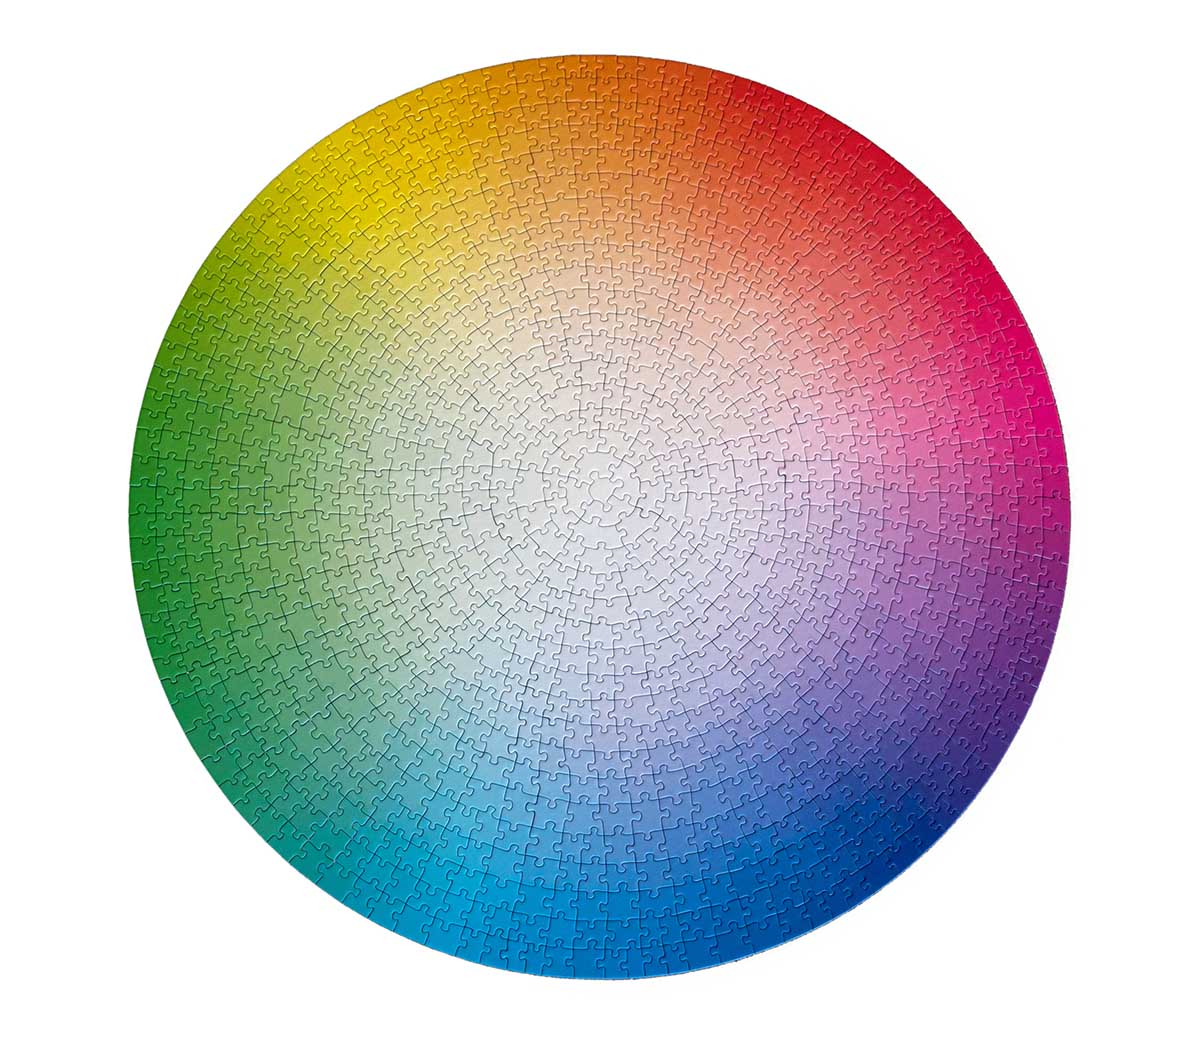 1000 Colours Wheel Graphics / Illustration Jigsaw Puzzle